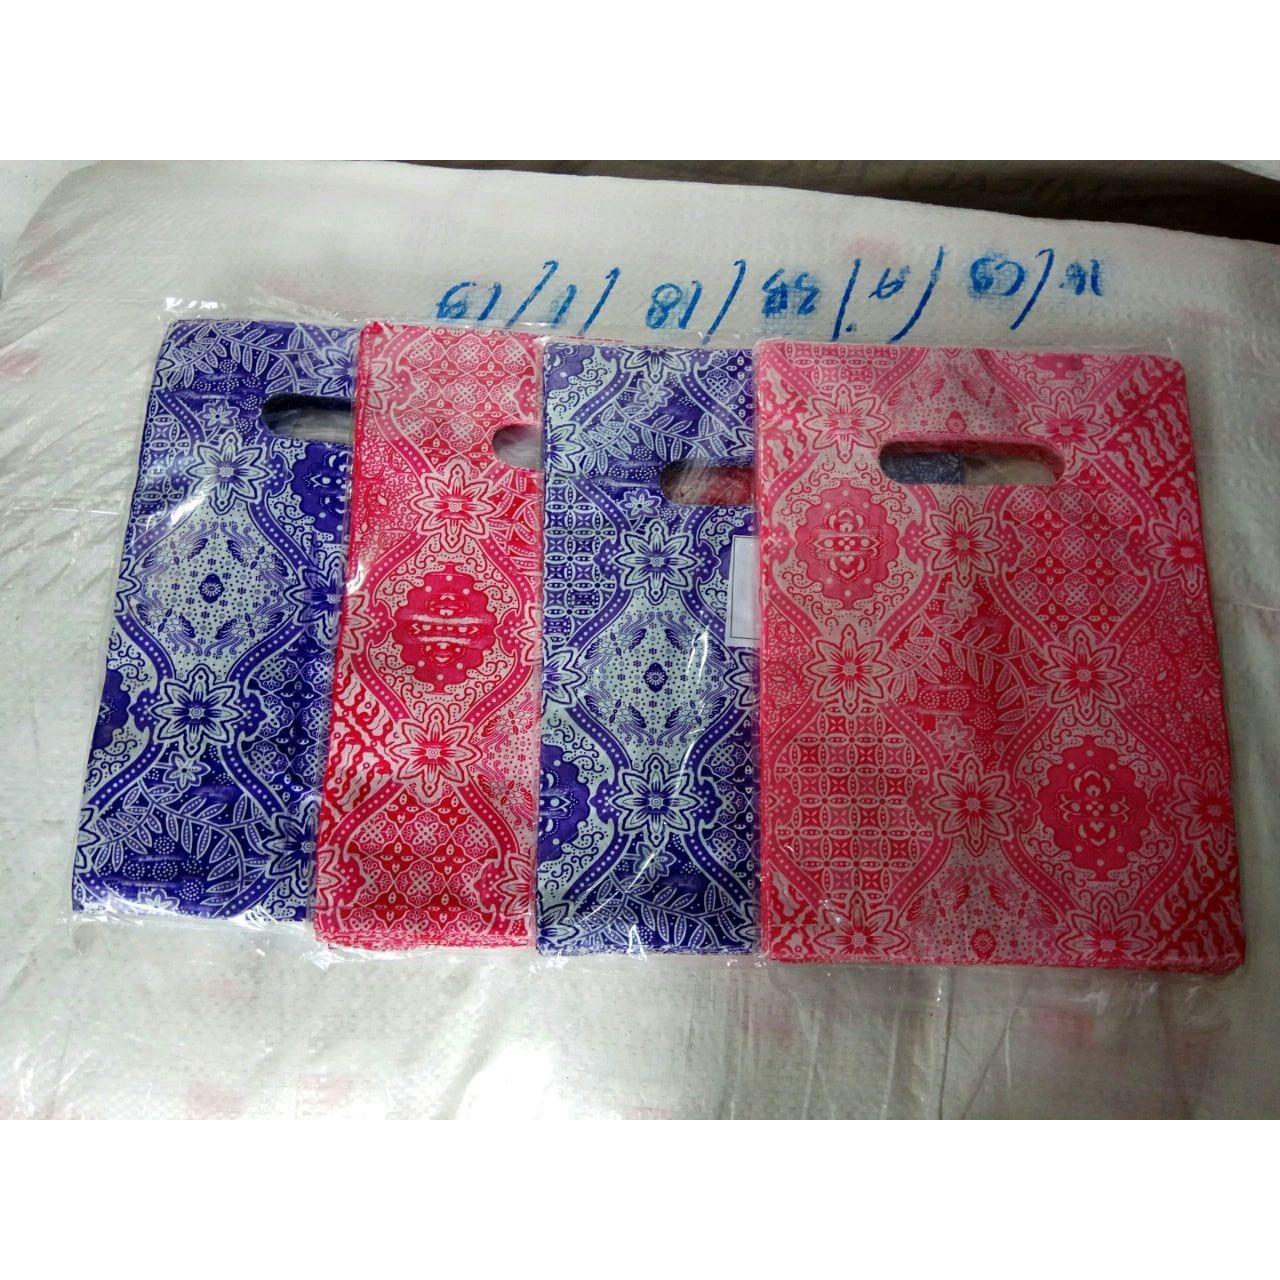 Hd Oval Batik 15x22 - kantong Oval Batik - kantong plastik baju